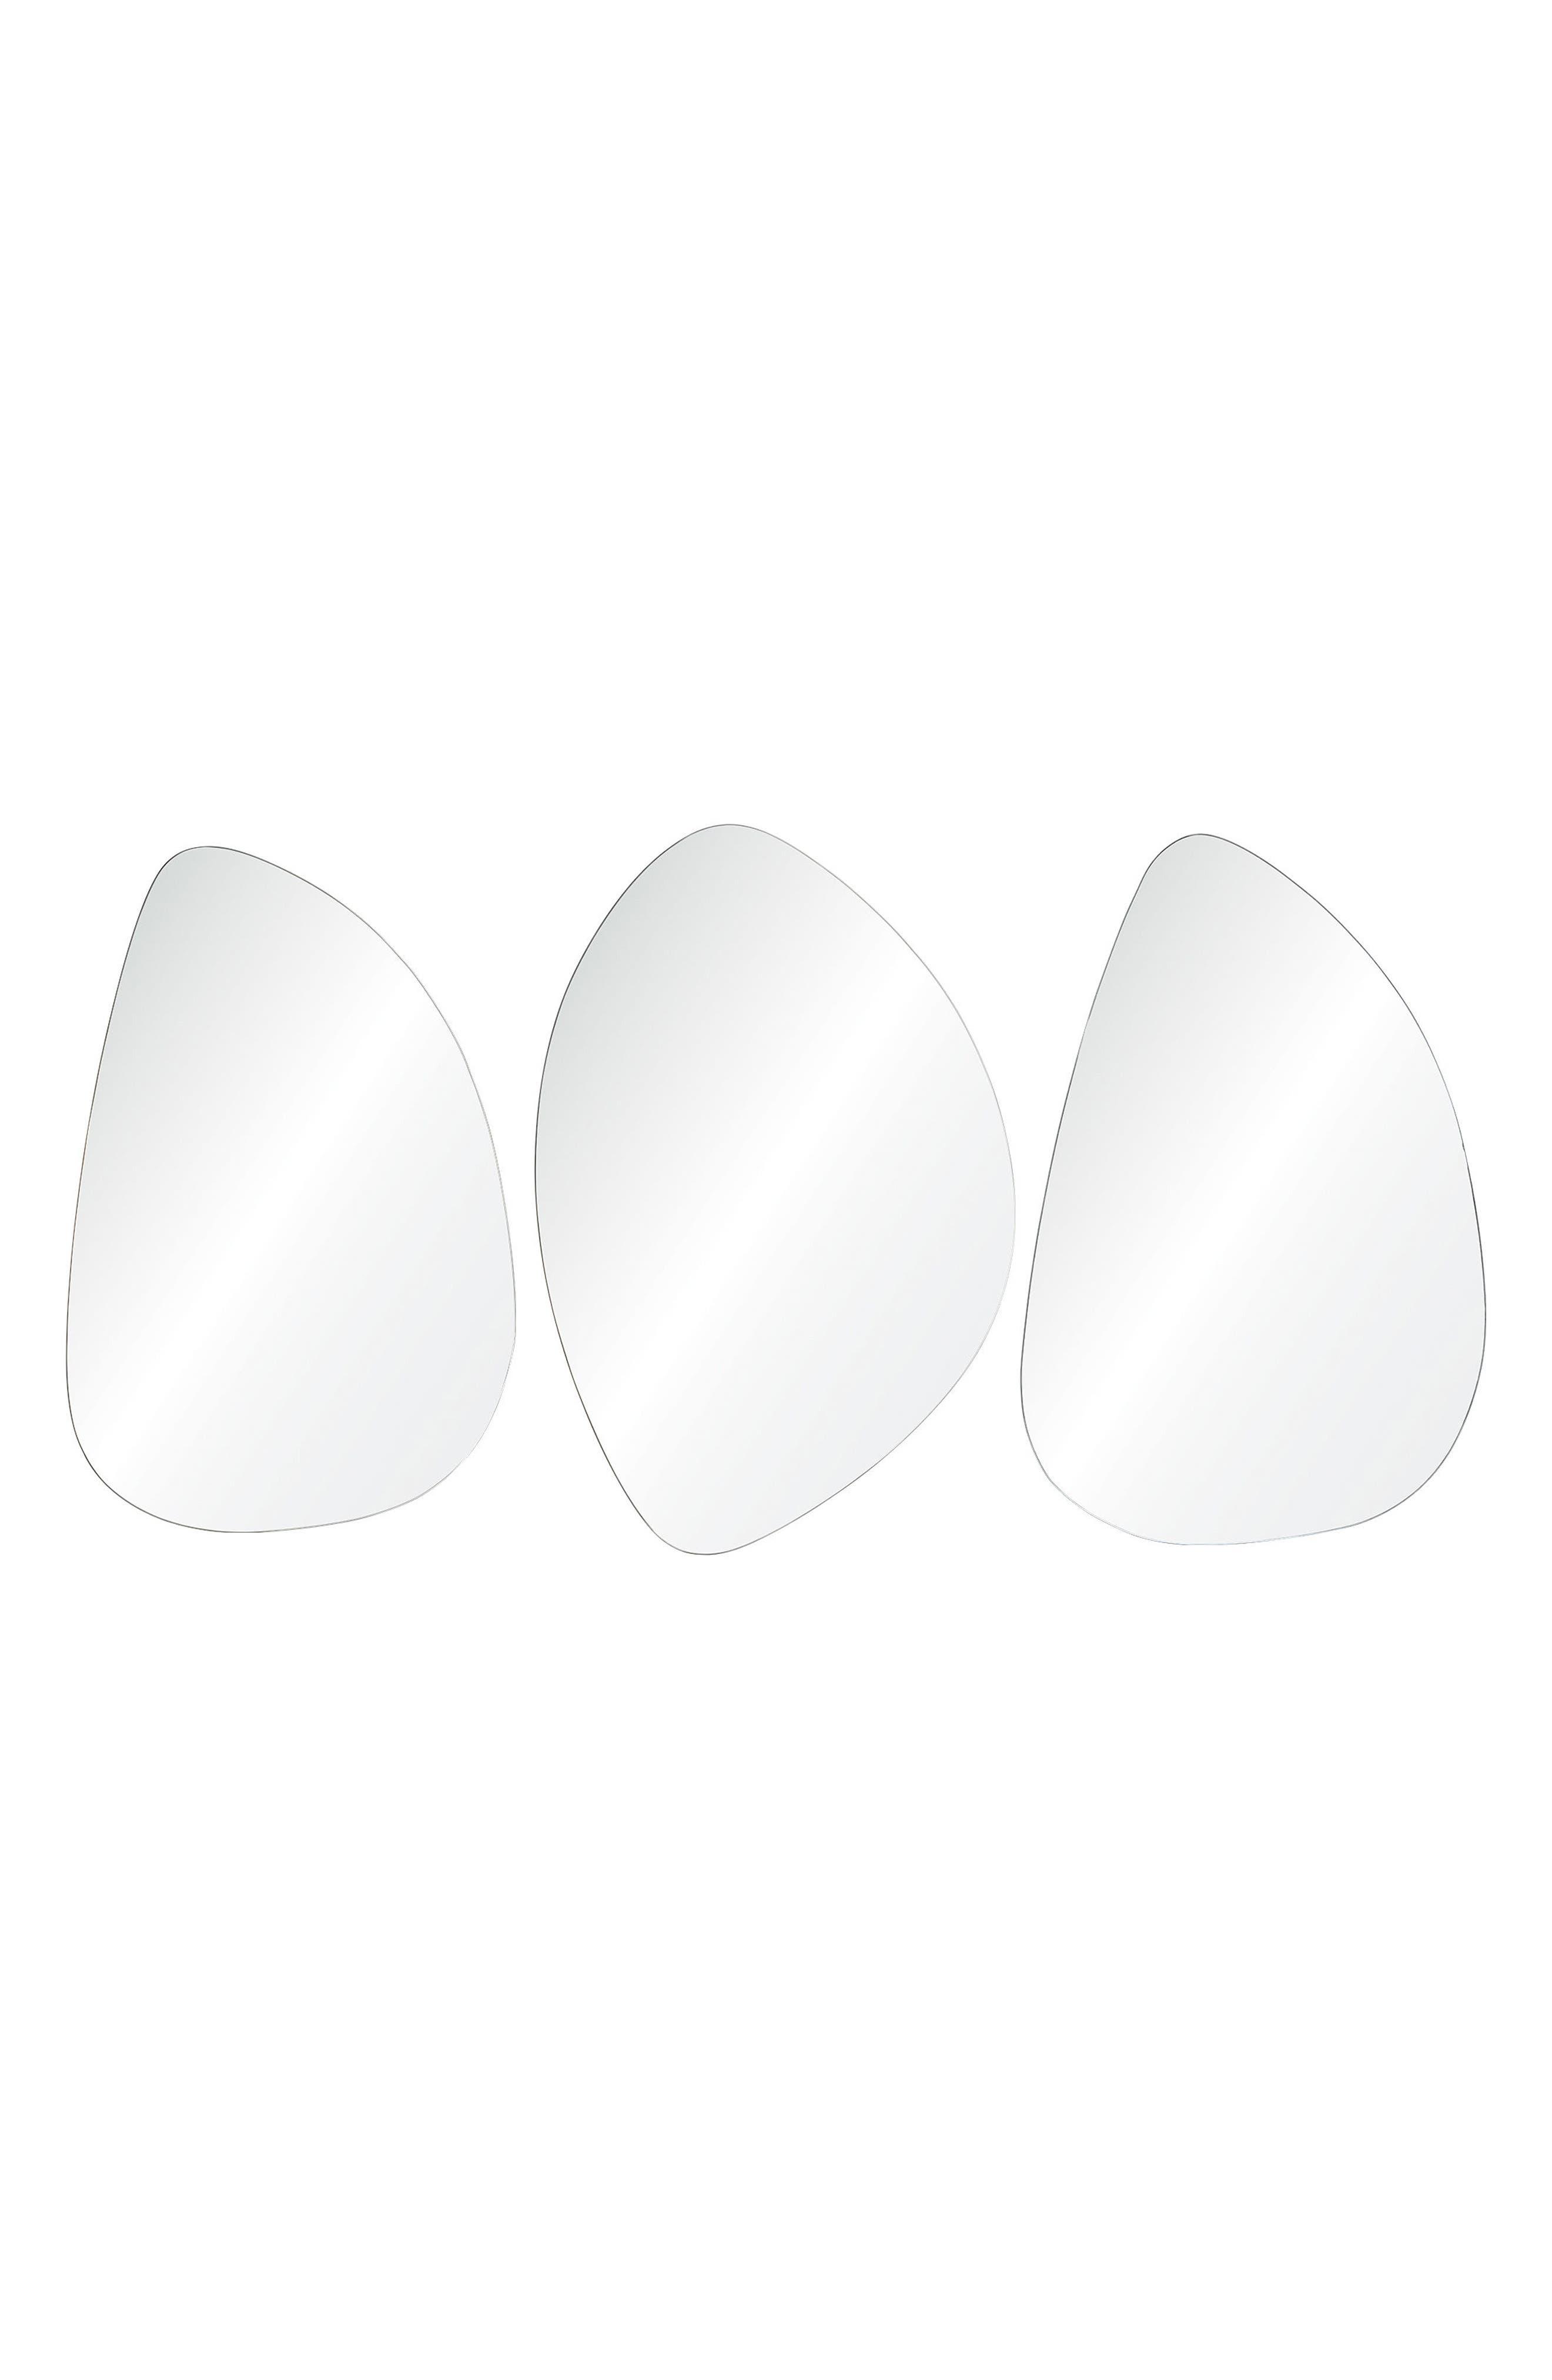 Main Image - Renwil Stockdale Set of 3 Mirrors